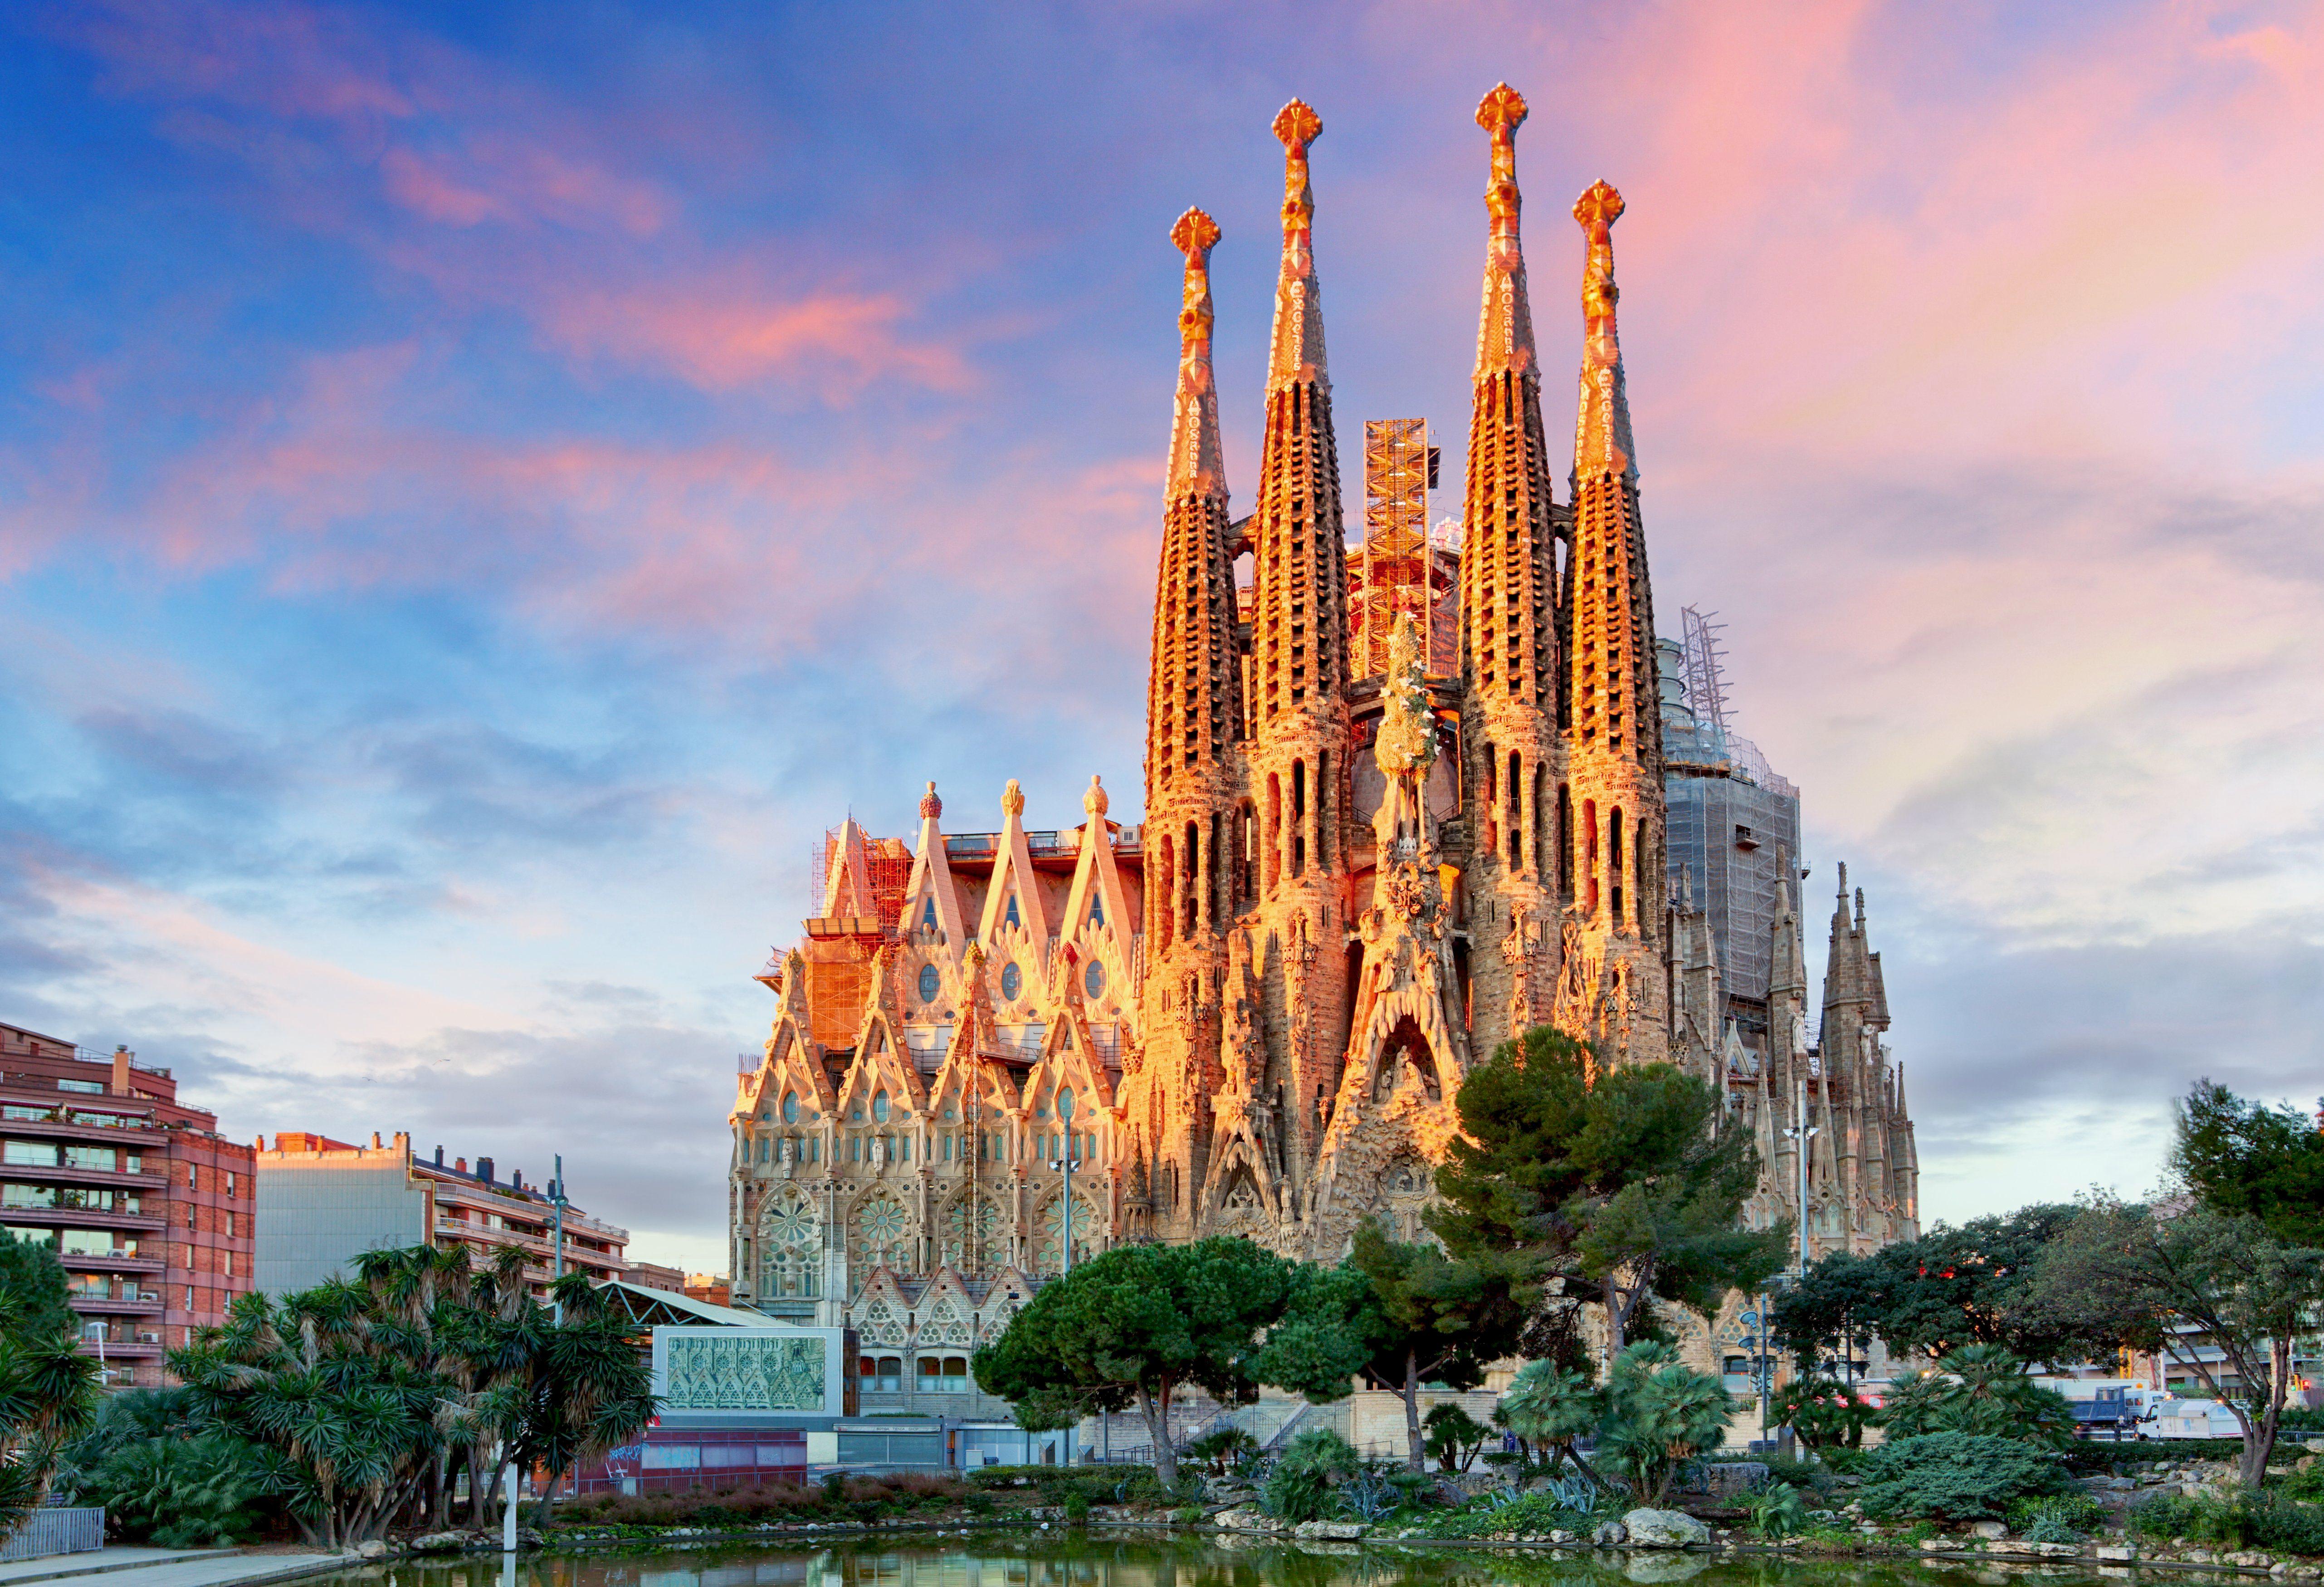 Sagrada Familia basilica in Barcelona.